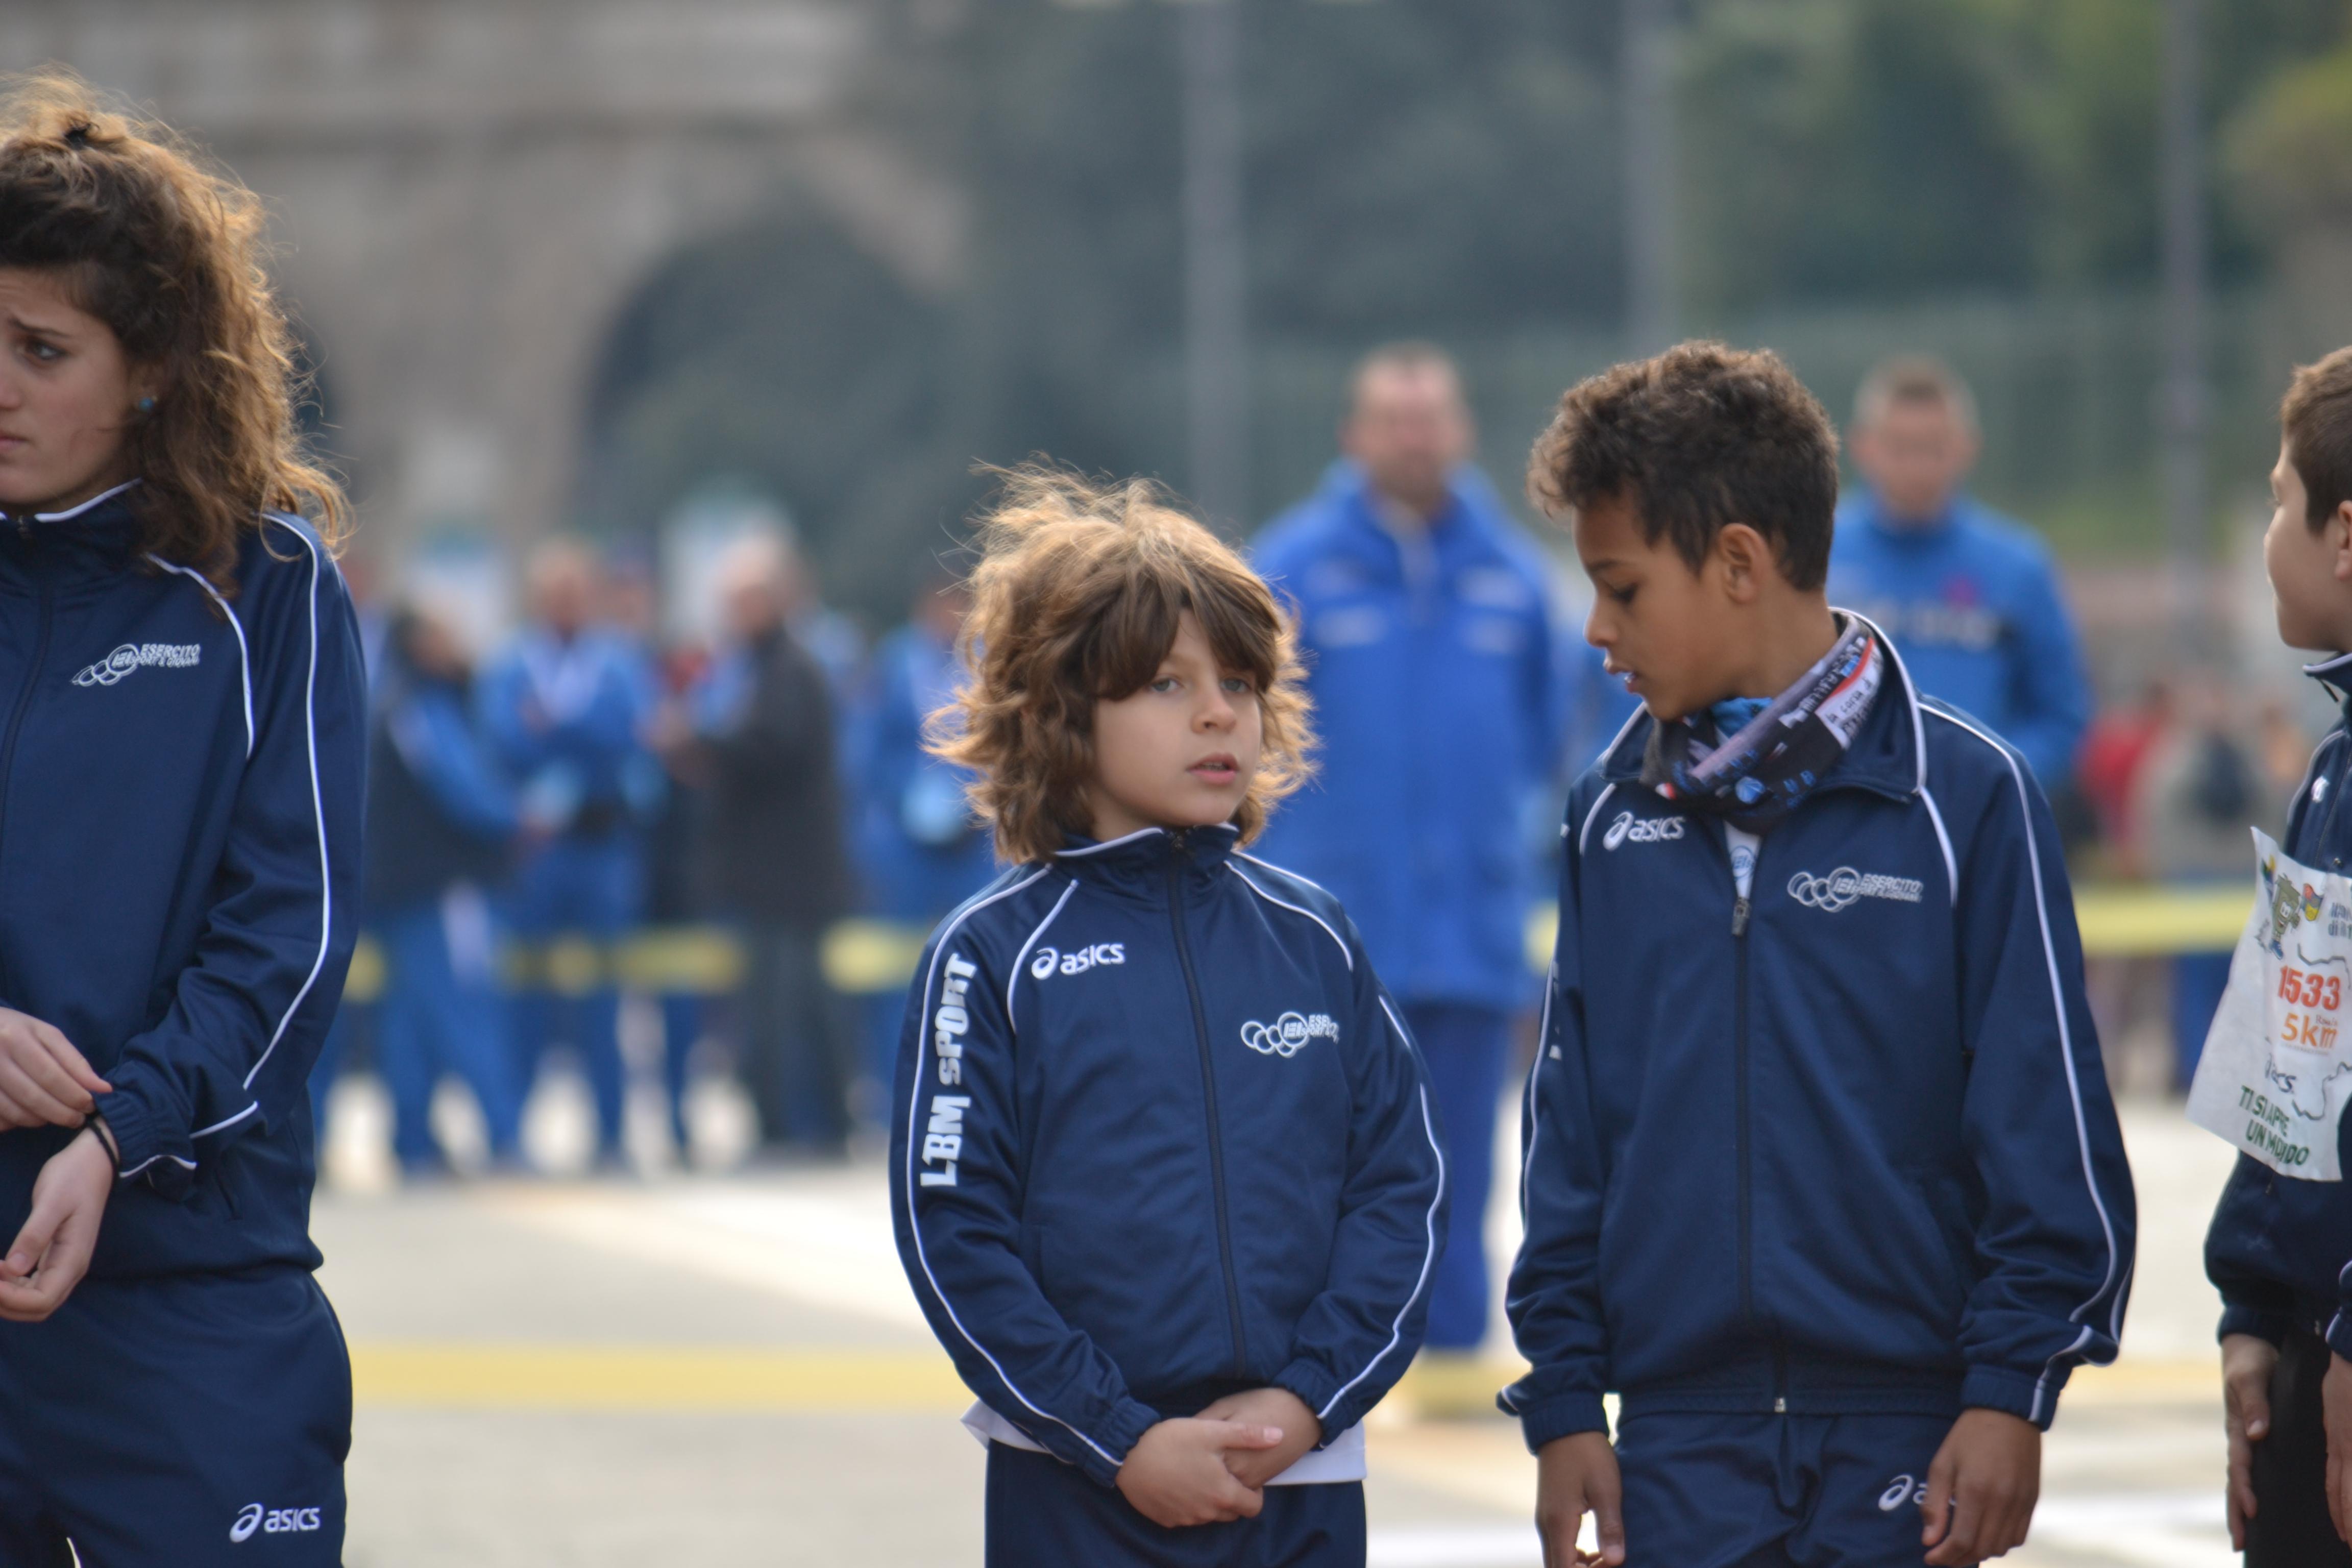 maratona-di-roma-2013-093